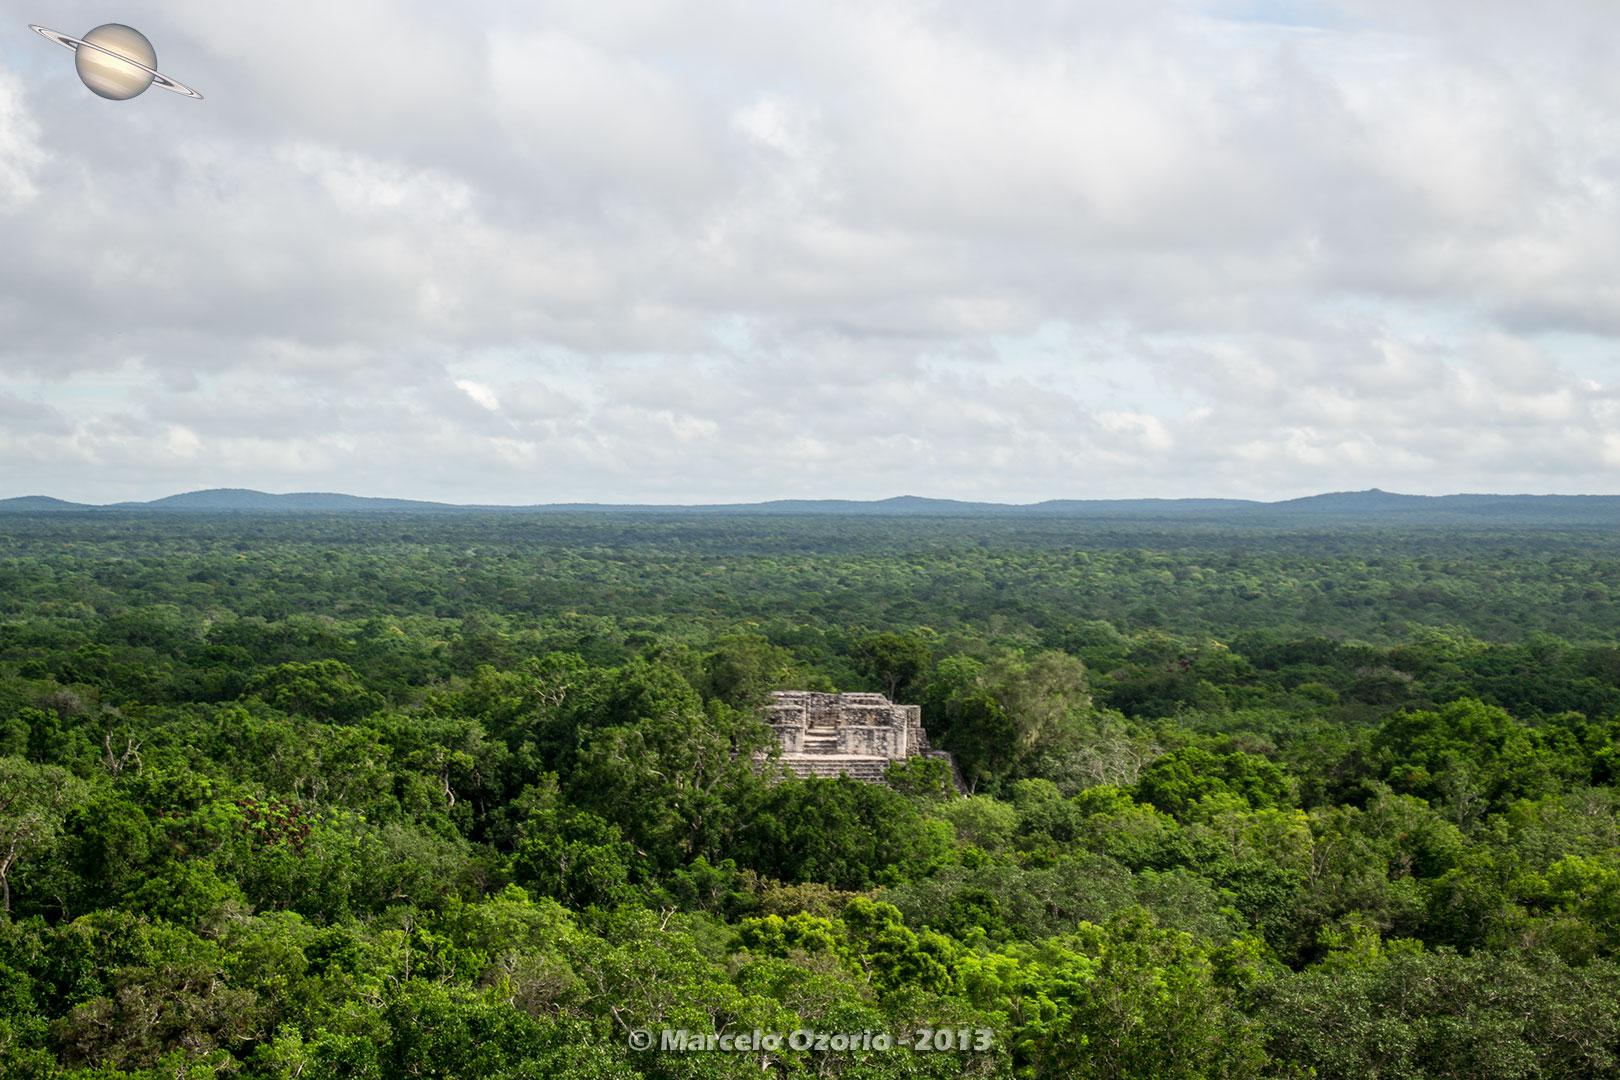 calakmul mayan civilization mexico 12 - Calakmul, City of the Two Adjacent Pyramids - Mexico